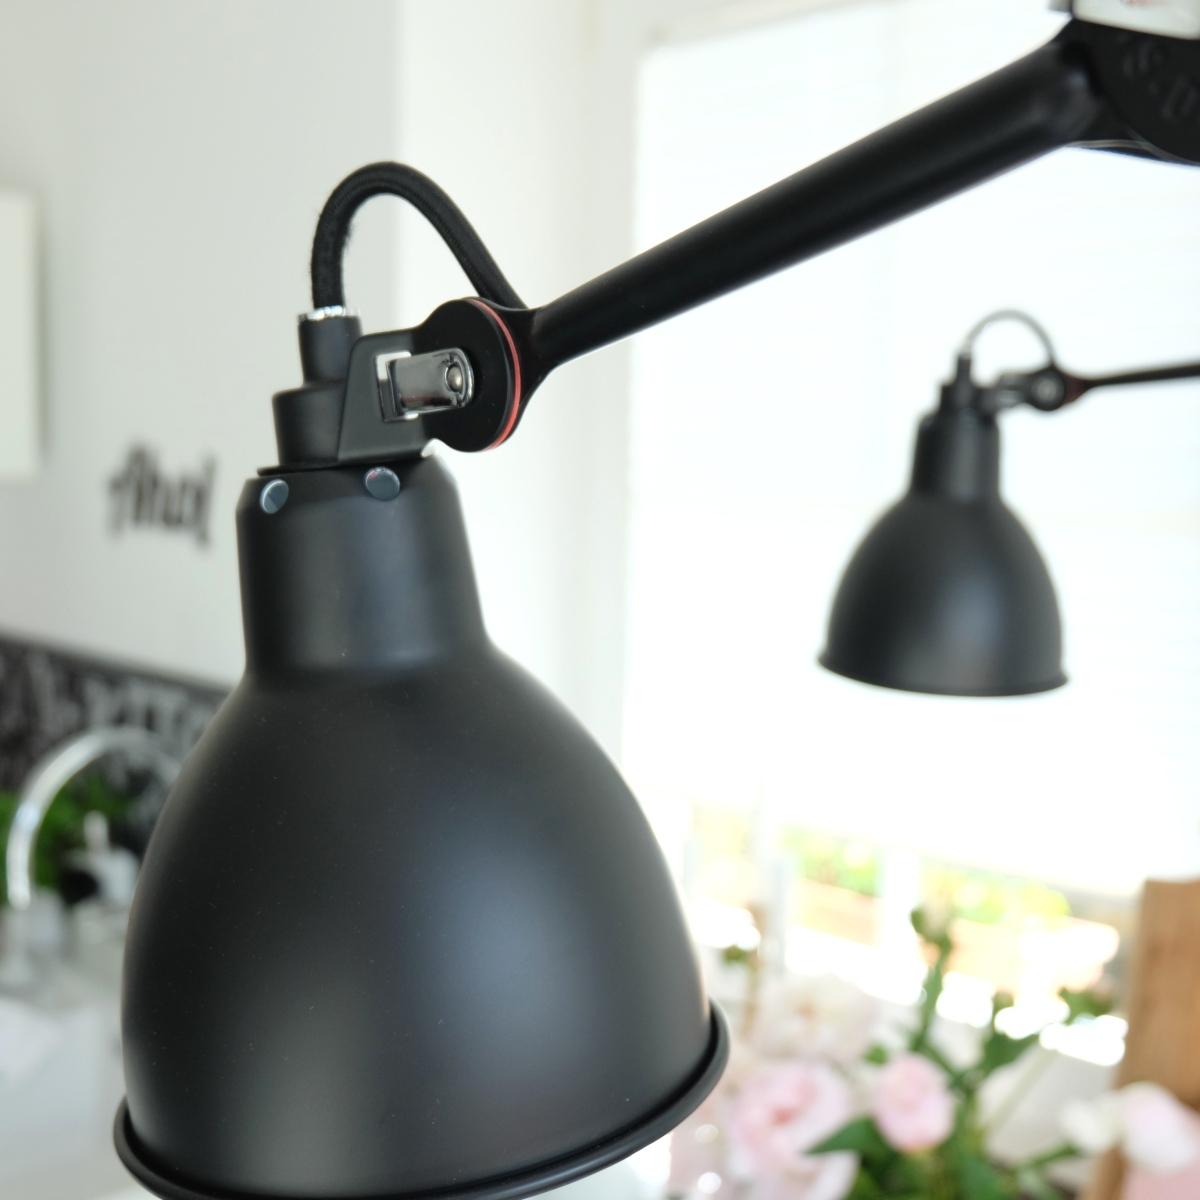 light11 DCW Lampe Küche 9 – so.leben.wir